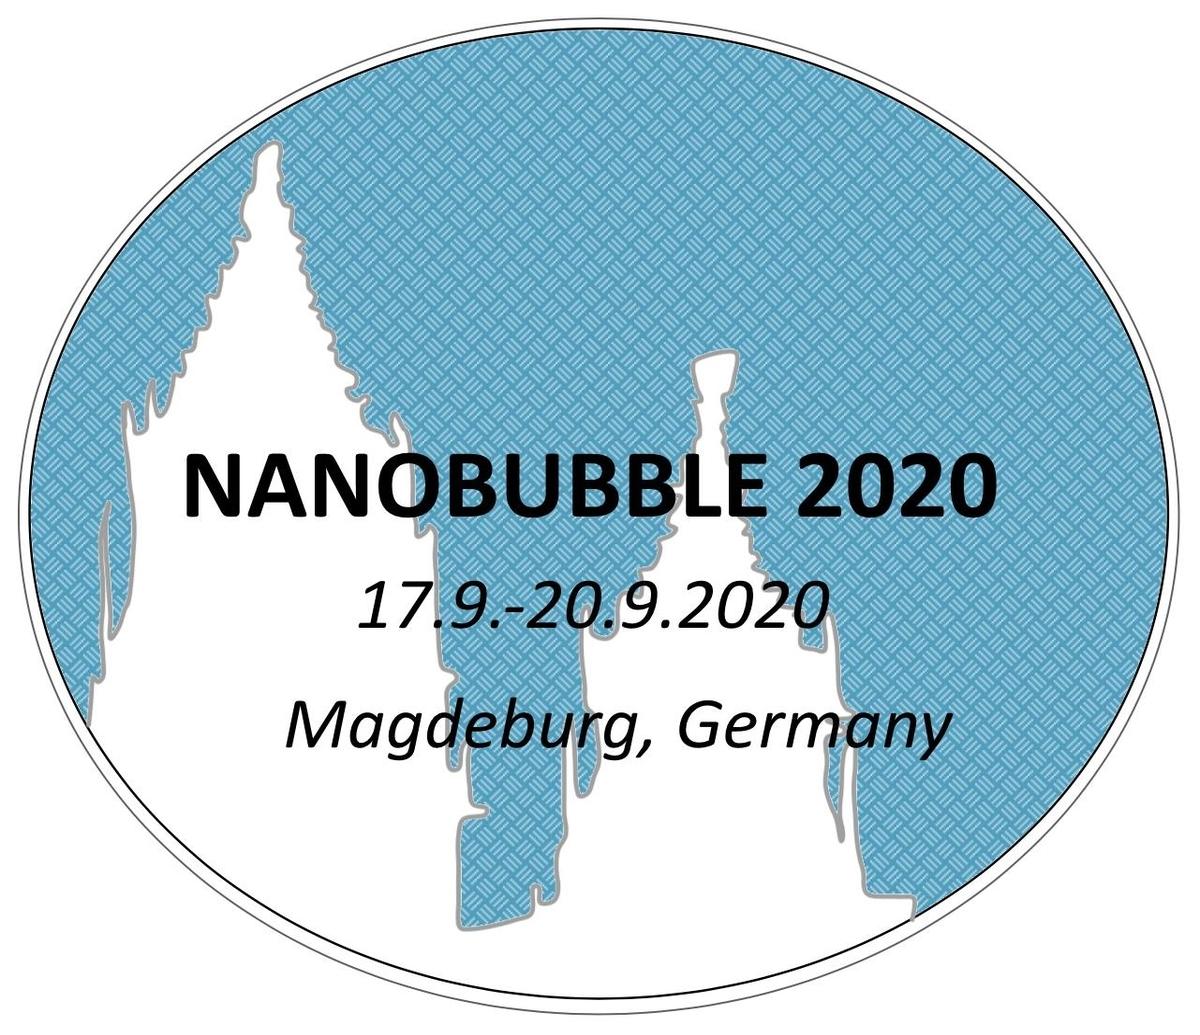 Nanobubble 2020